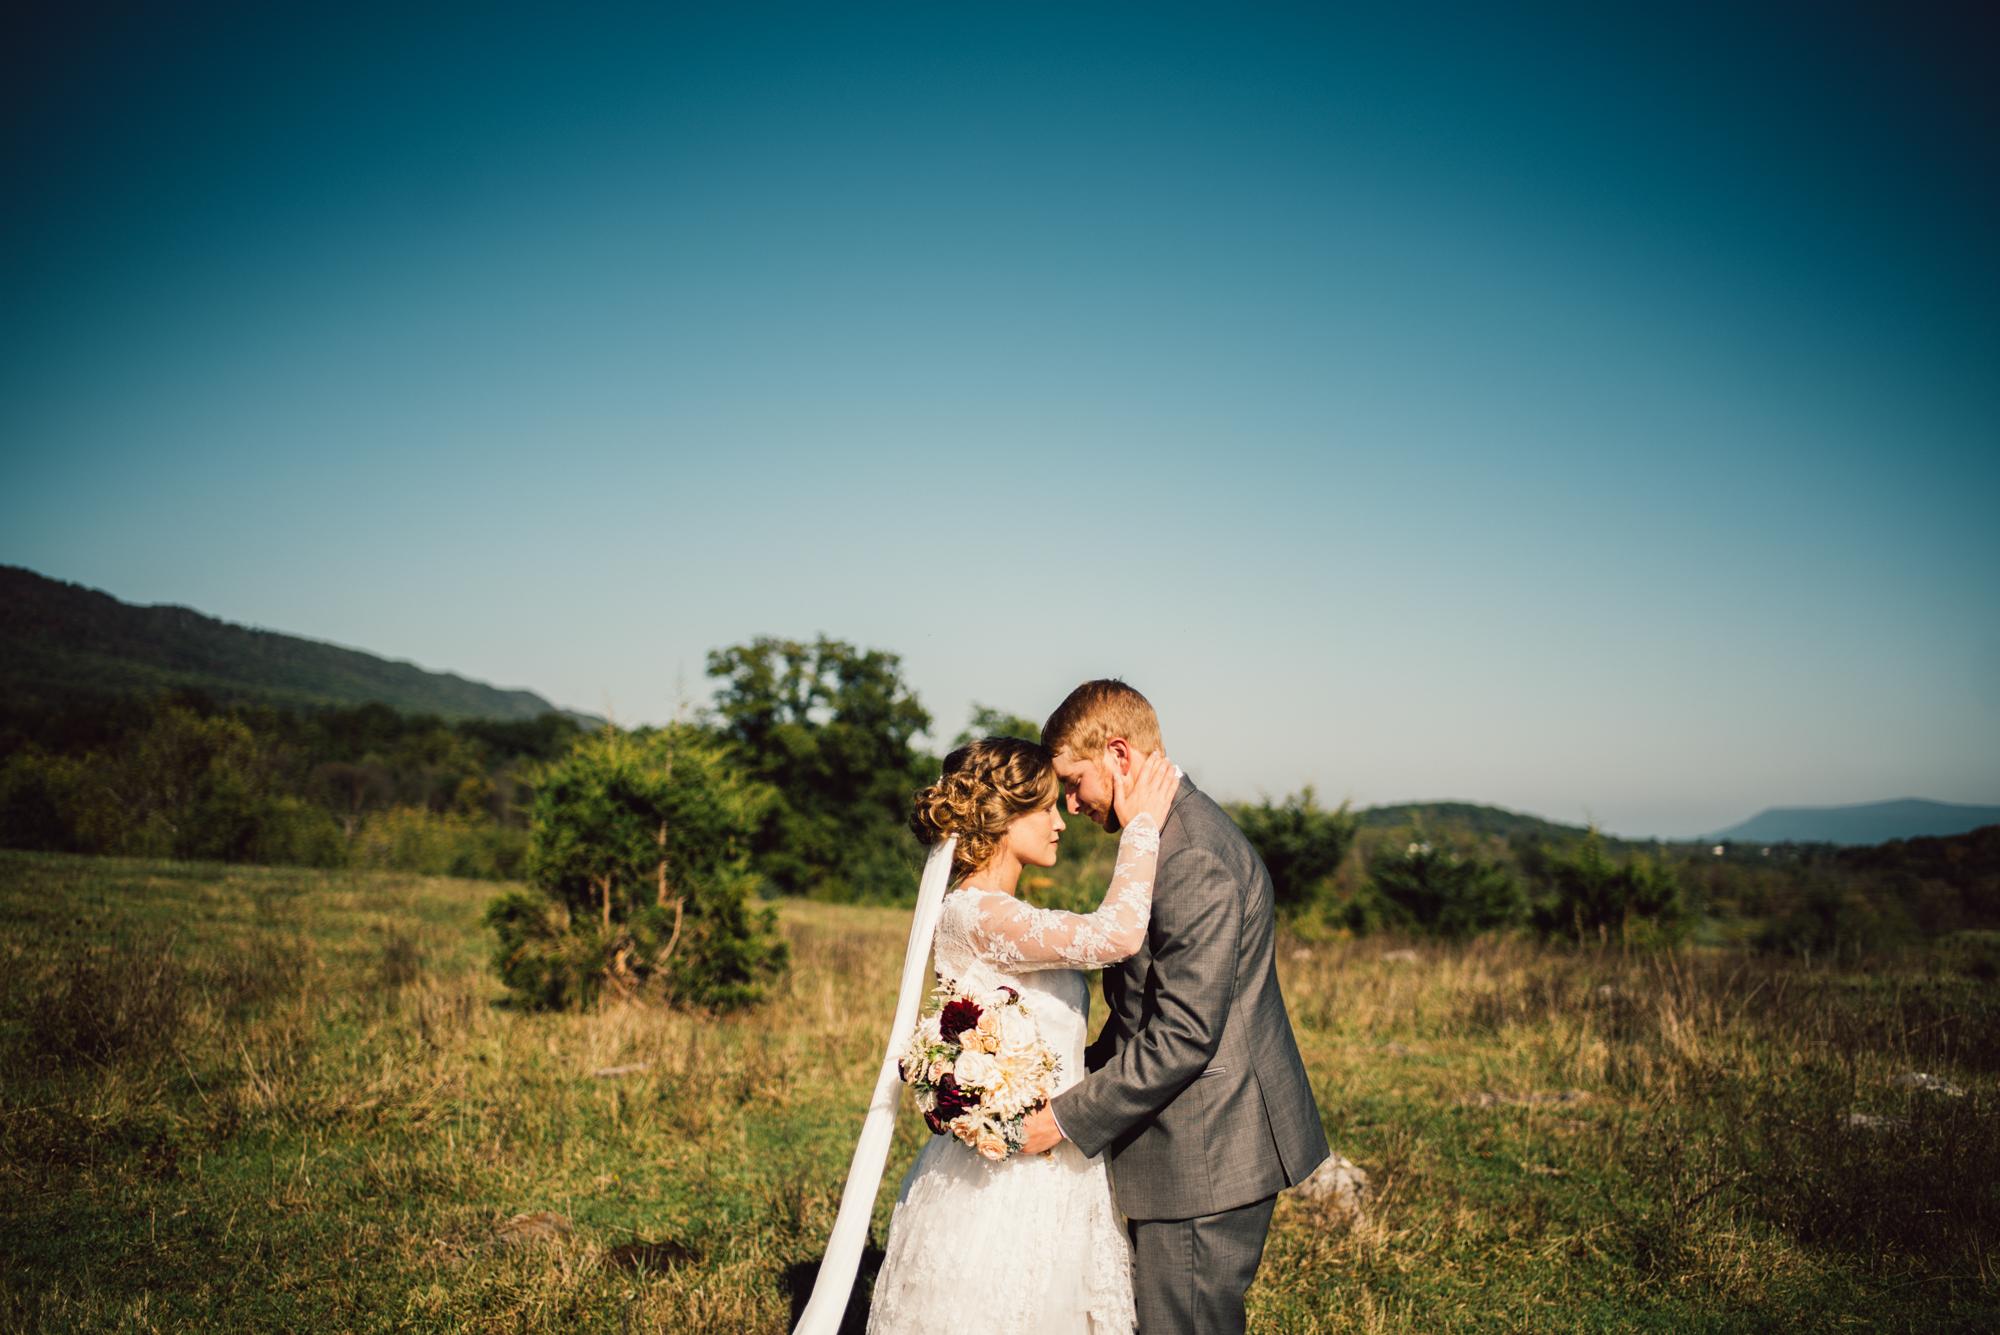 Ashley-and-Michael-Beaune-Woodstock-Virginia-Wedding-Shenandoah-Valley_69.JPG